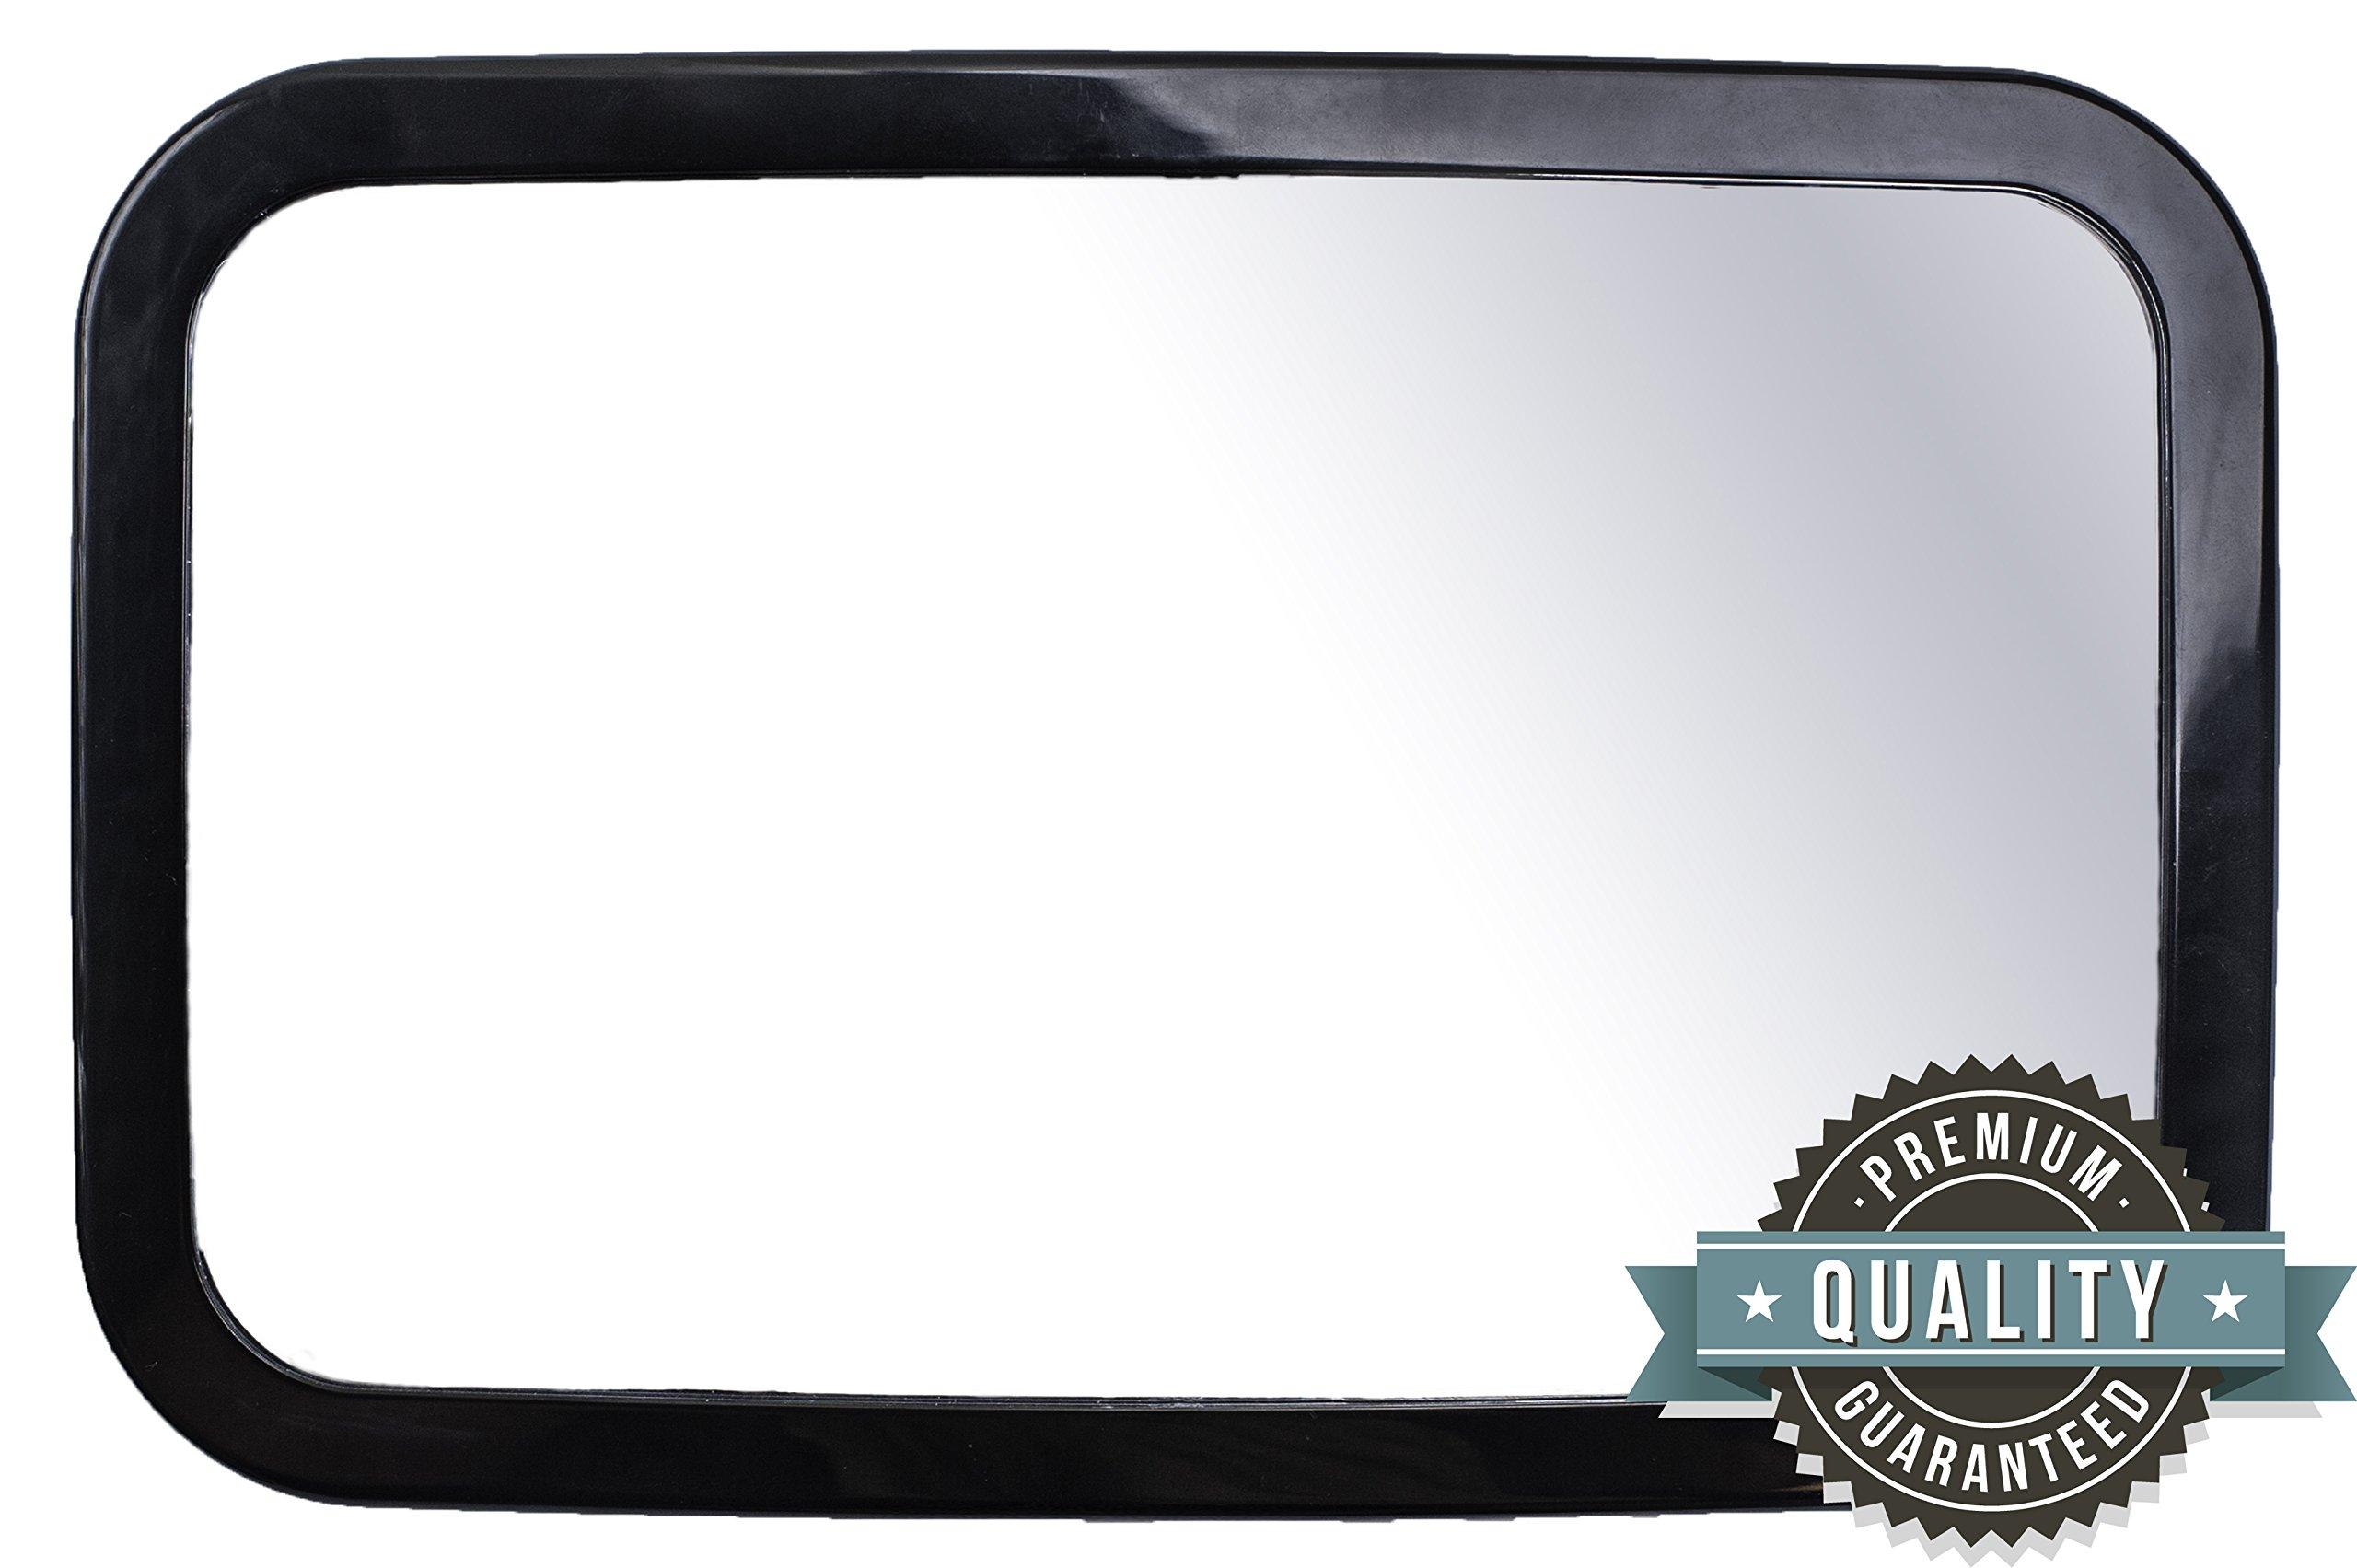 Greyjoy Baby Rear Seat Car Mirror, Black, 11.5 x 0.8 x 7.5 Inch